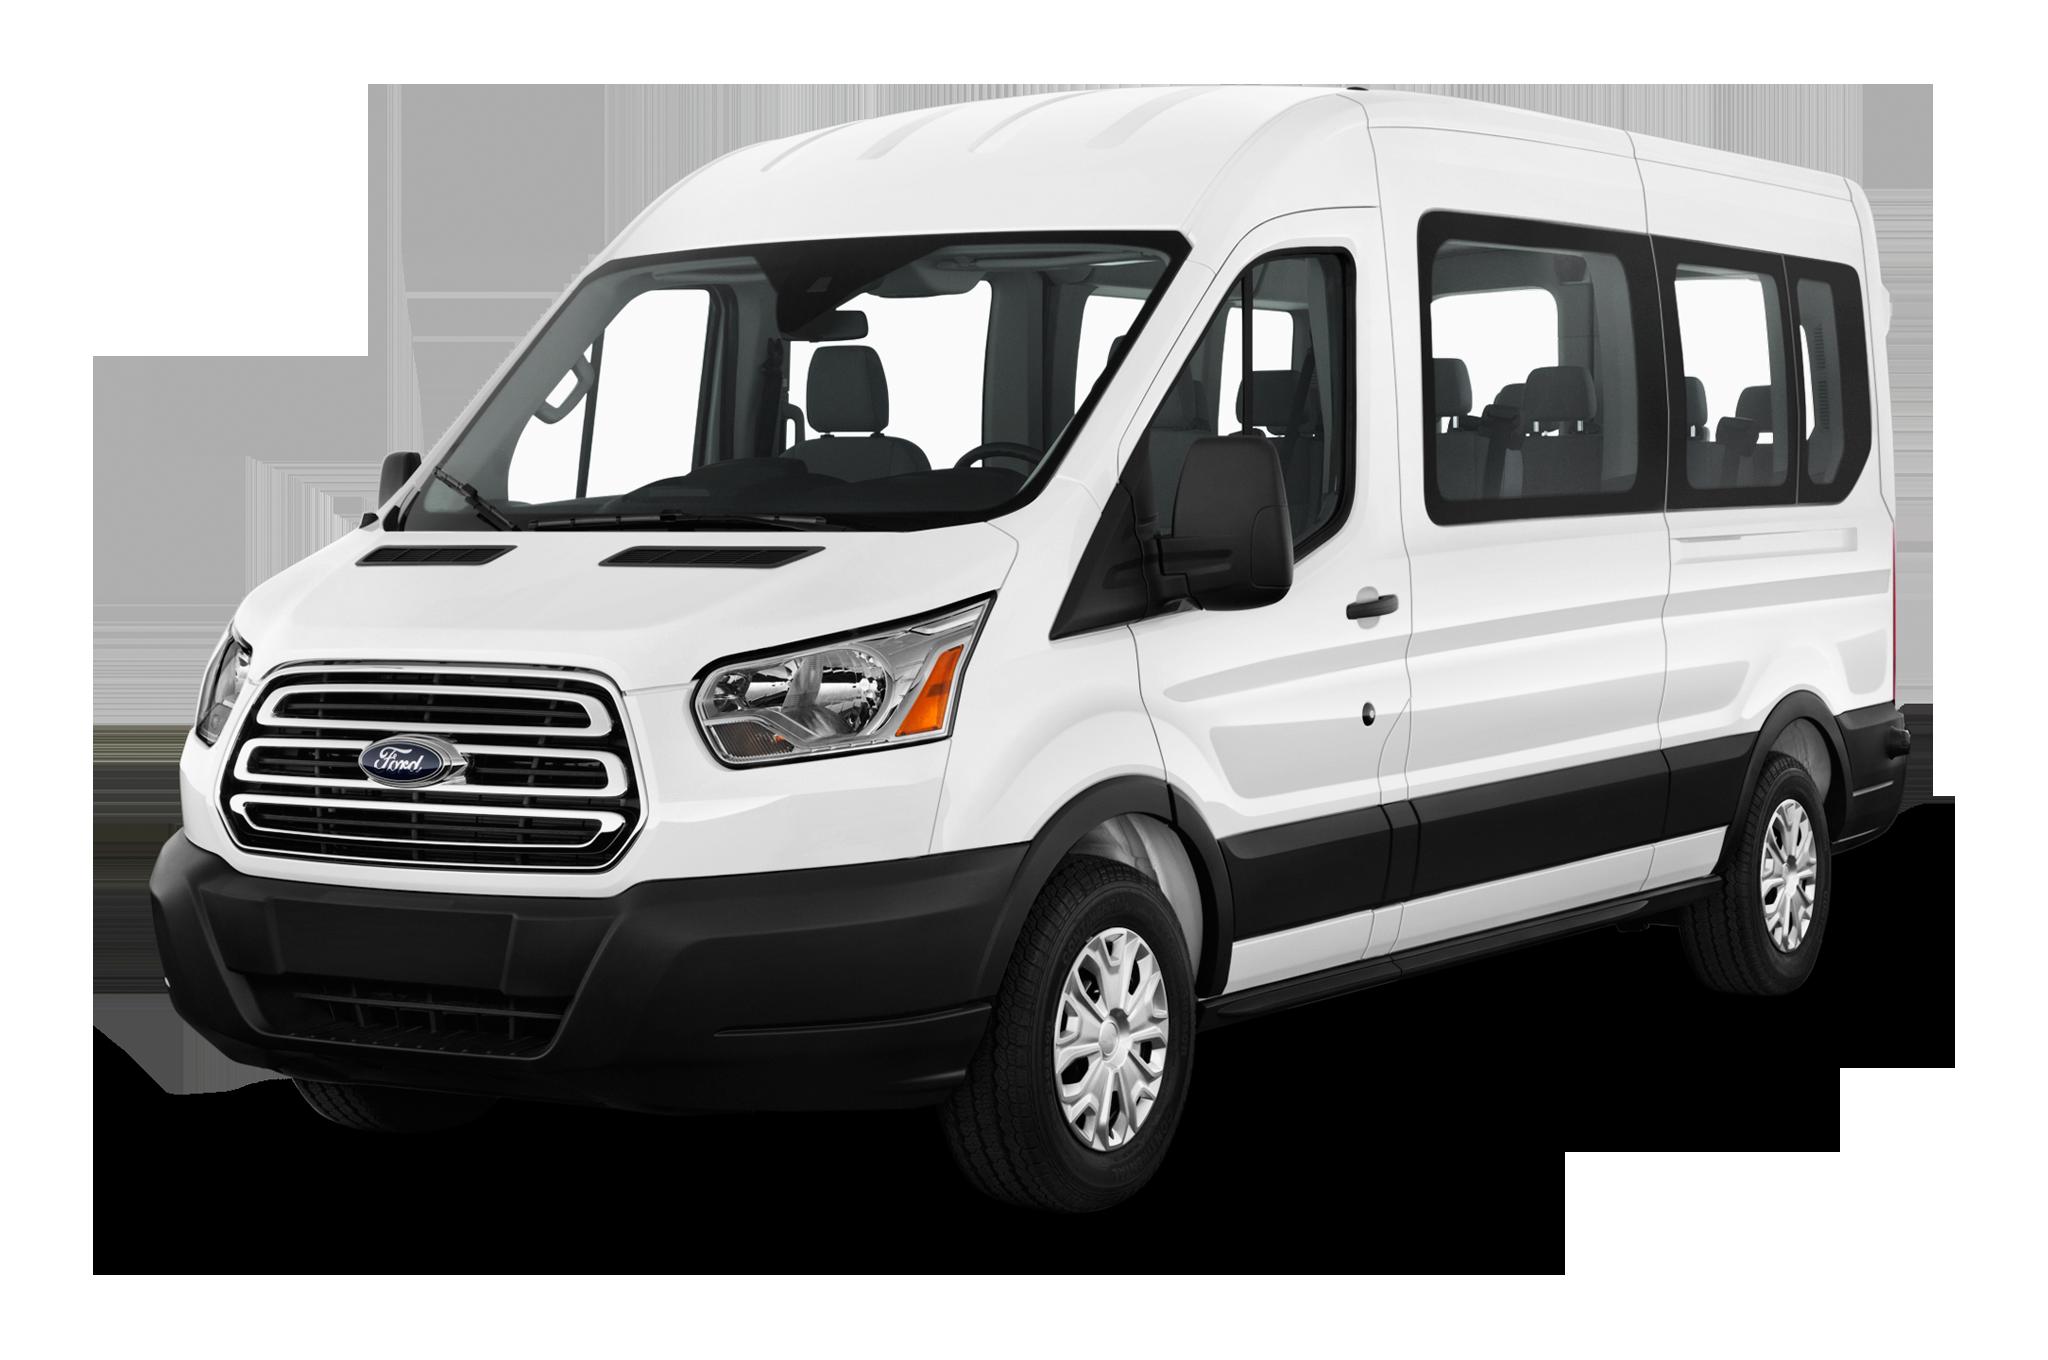 Minibus PNG Images.